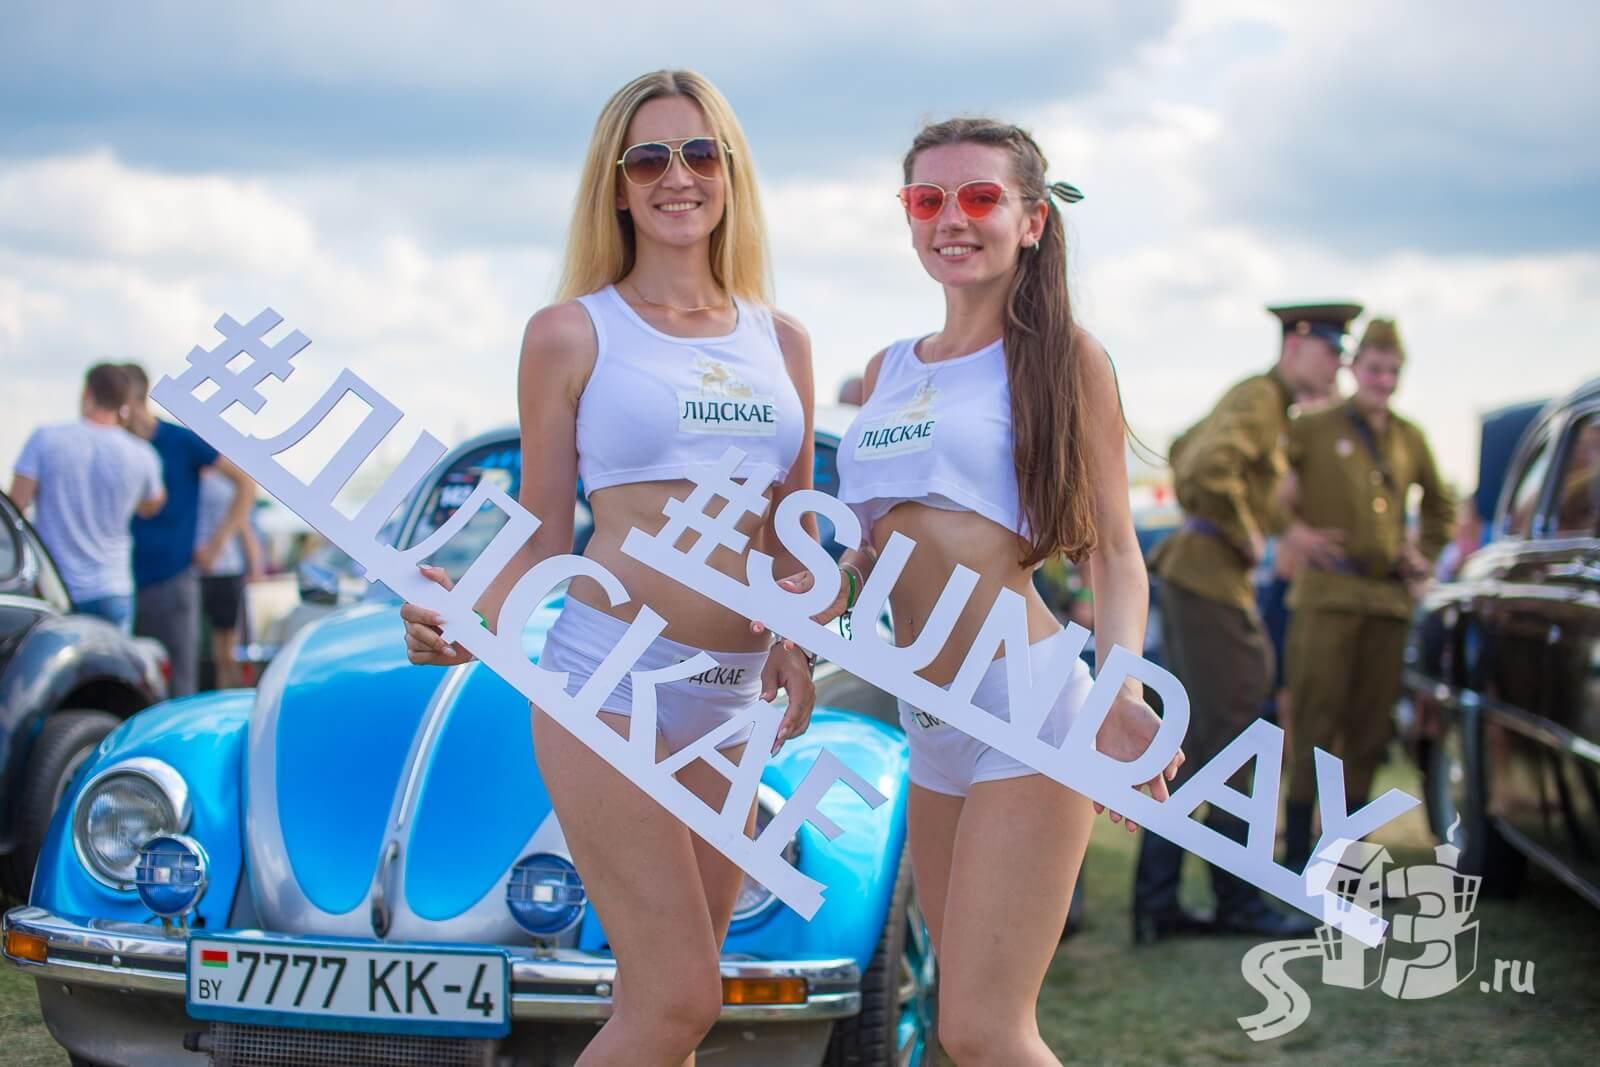 Sunday car festival, Belarus